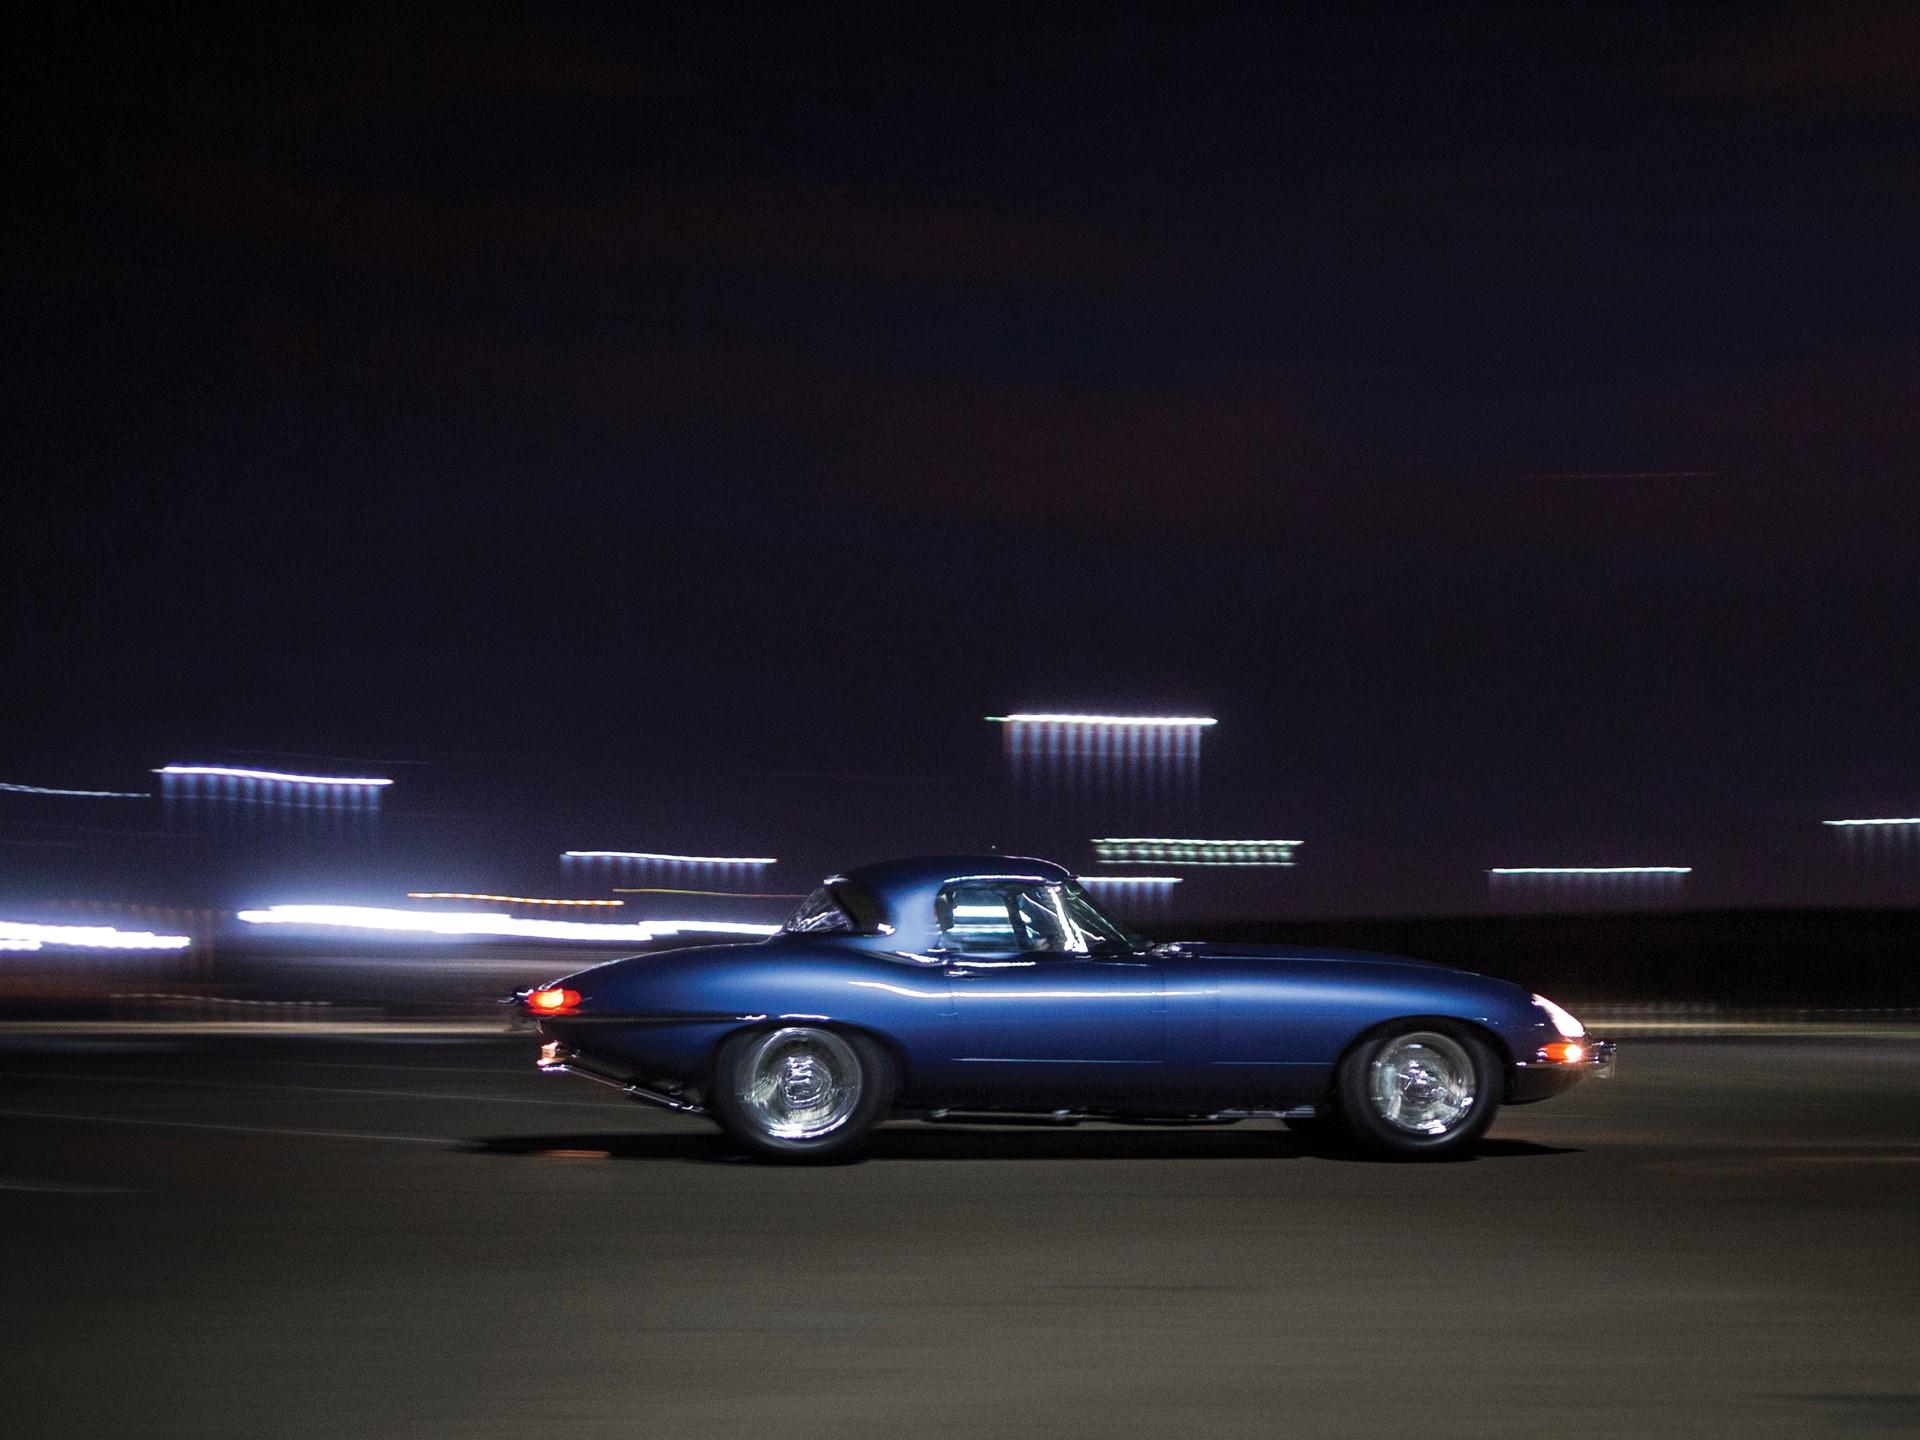 1965 Jaguar E-Type Series 1 4.2-Litre Roadster